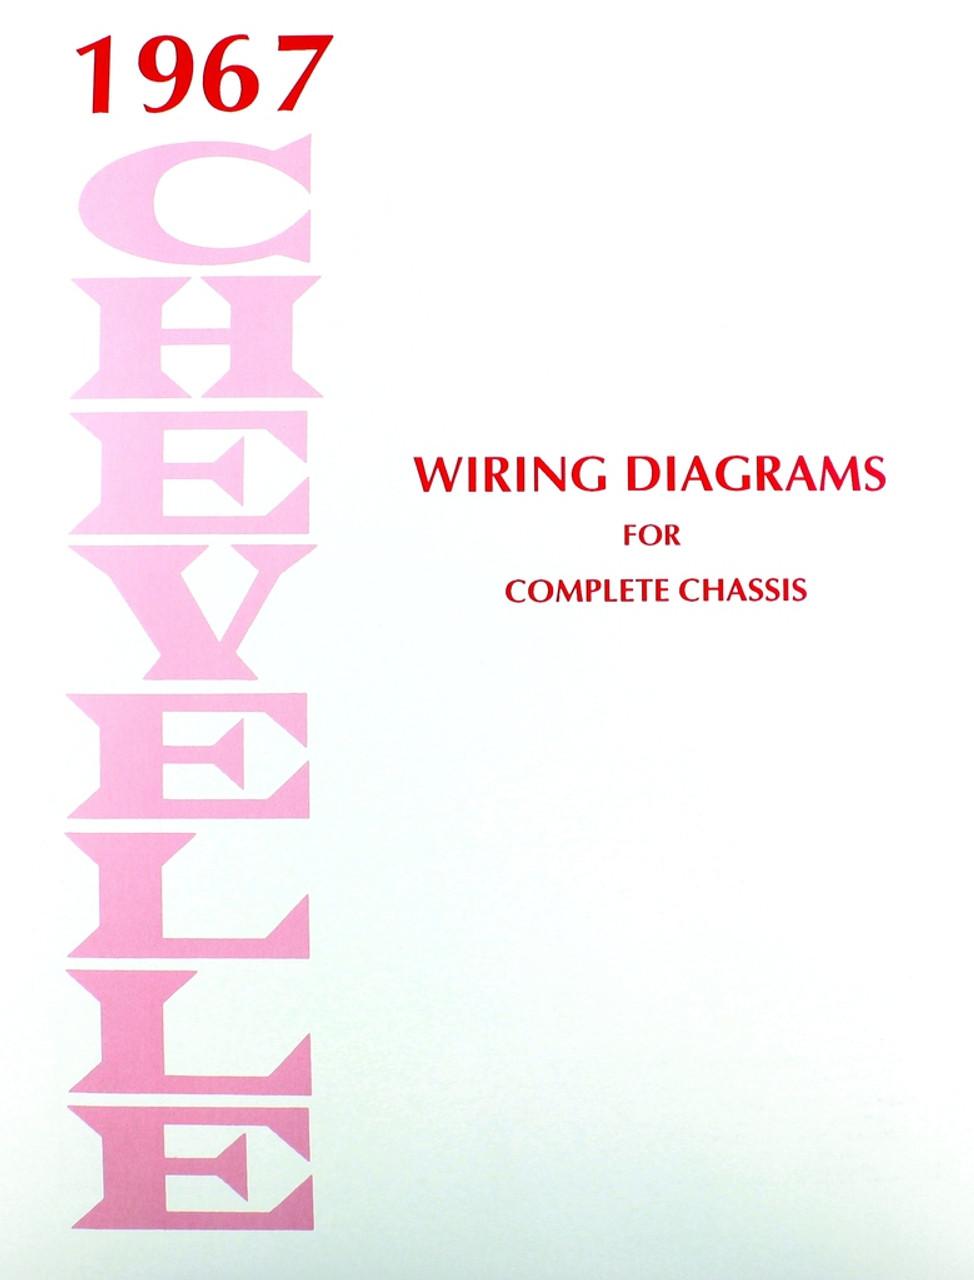 67 1967 chevelle el camino electrical wiring diagram manual i 5 1965 chevy wiring diagram 67 1967 chevelle el camino electrical wiring diagram manual